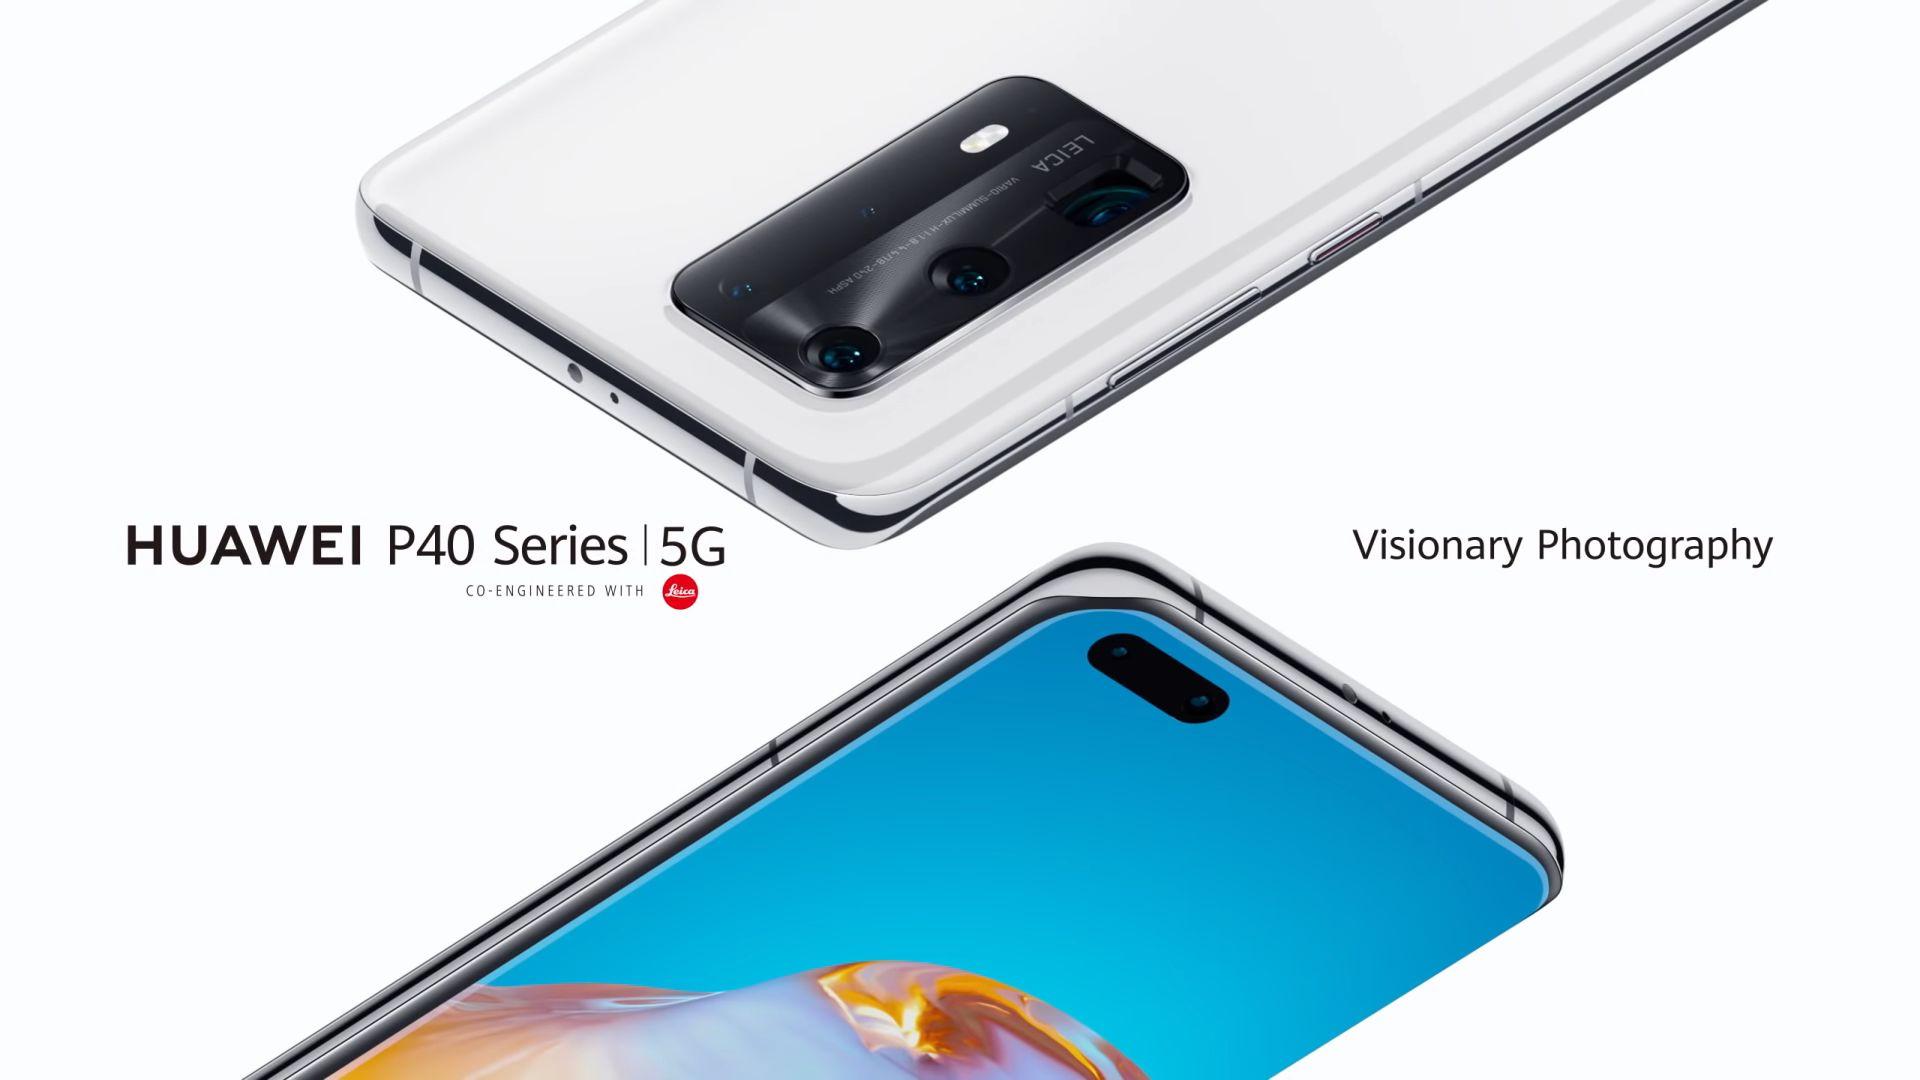 Huawei P40, P40 Pro e P40 Pro+ ufficiali: Huawei sfida i Galaxy S20, S20+ e S20 Ultra a prezzi interessanti,ma...